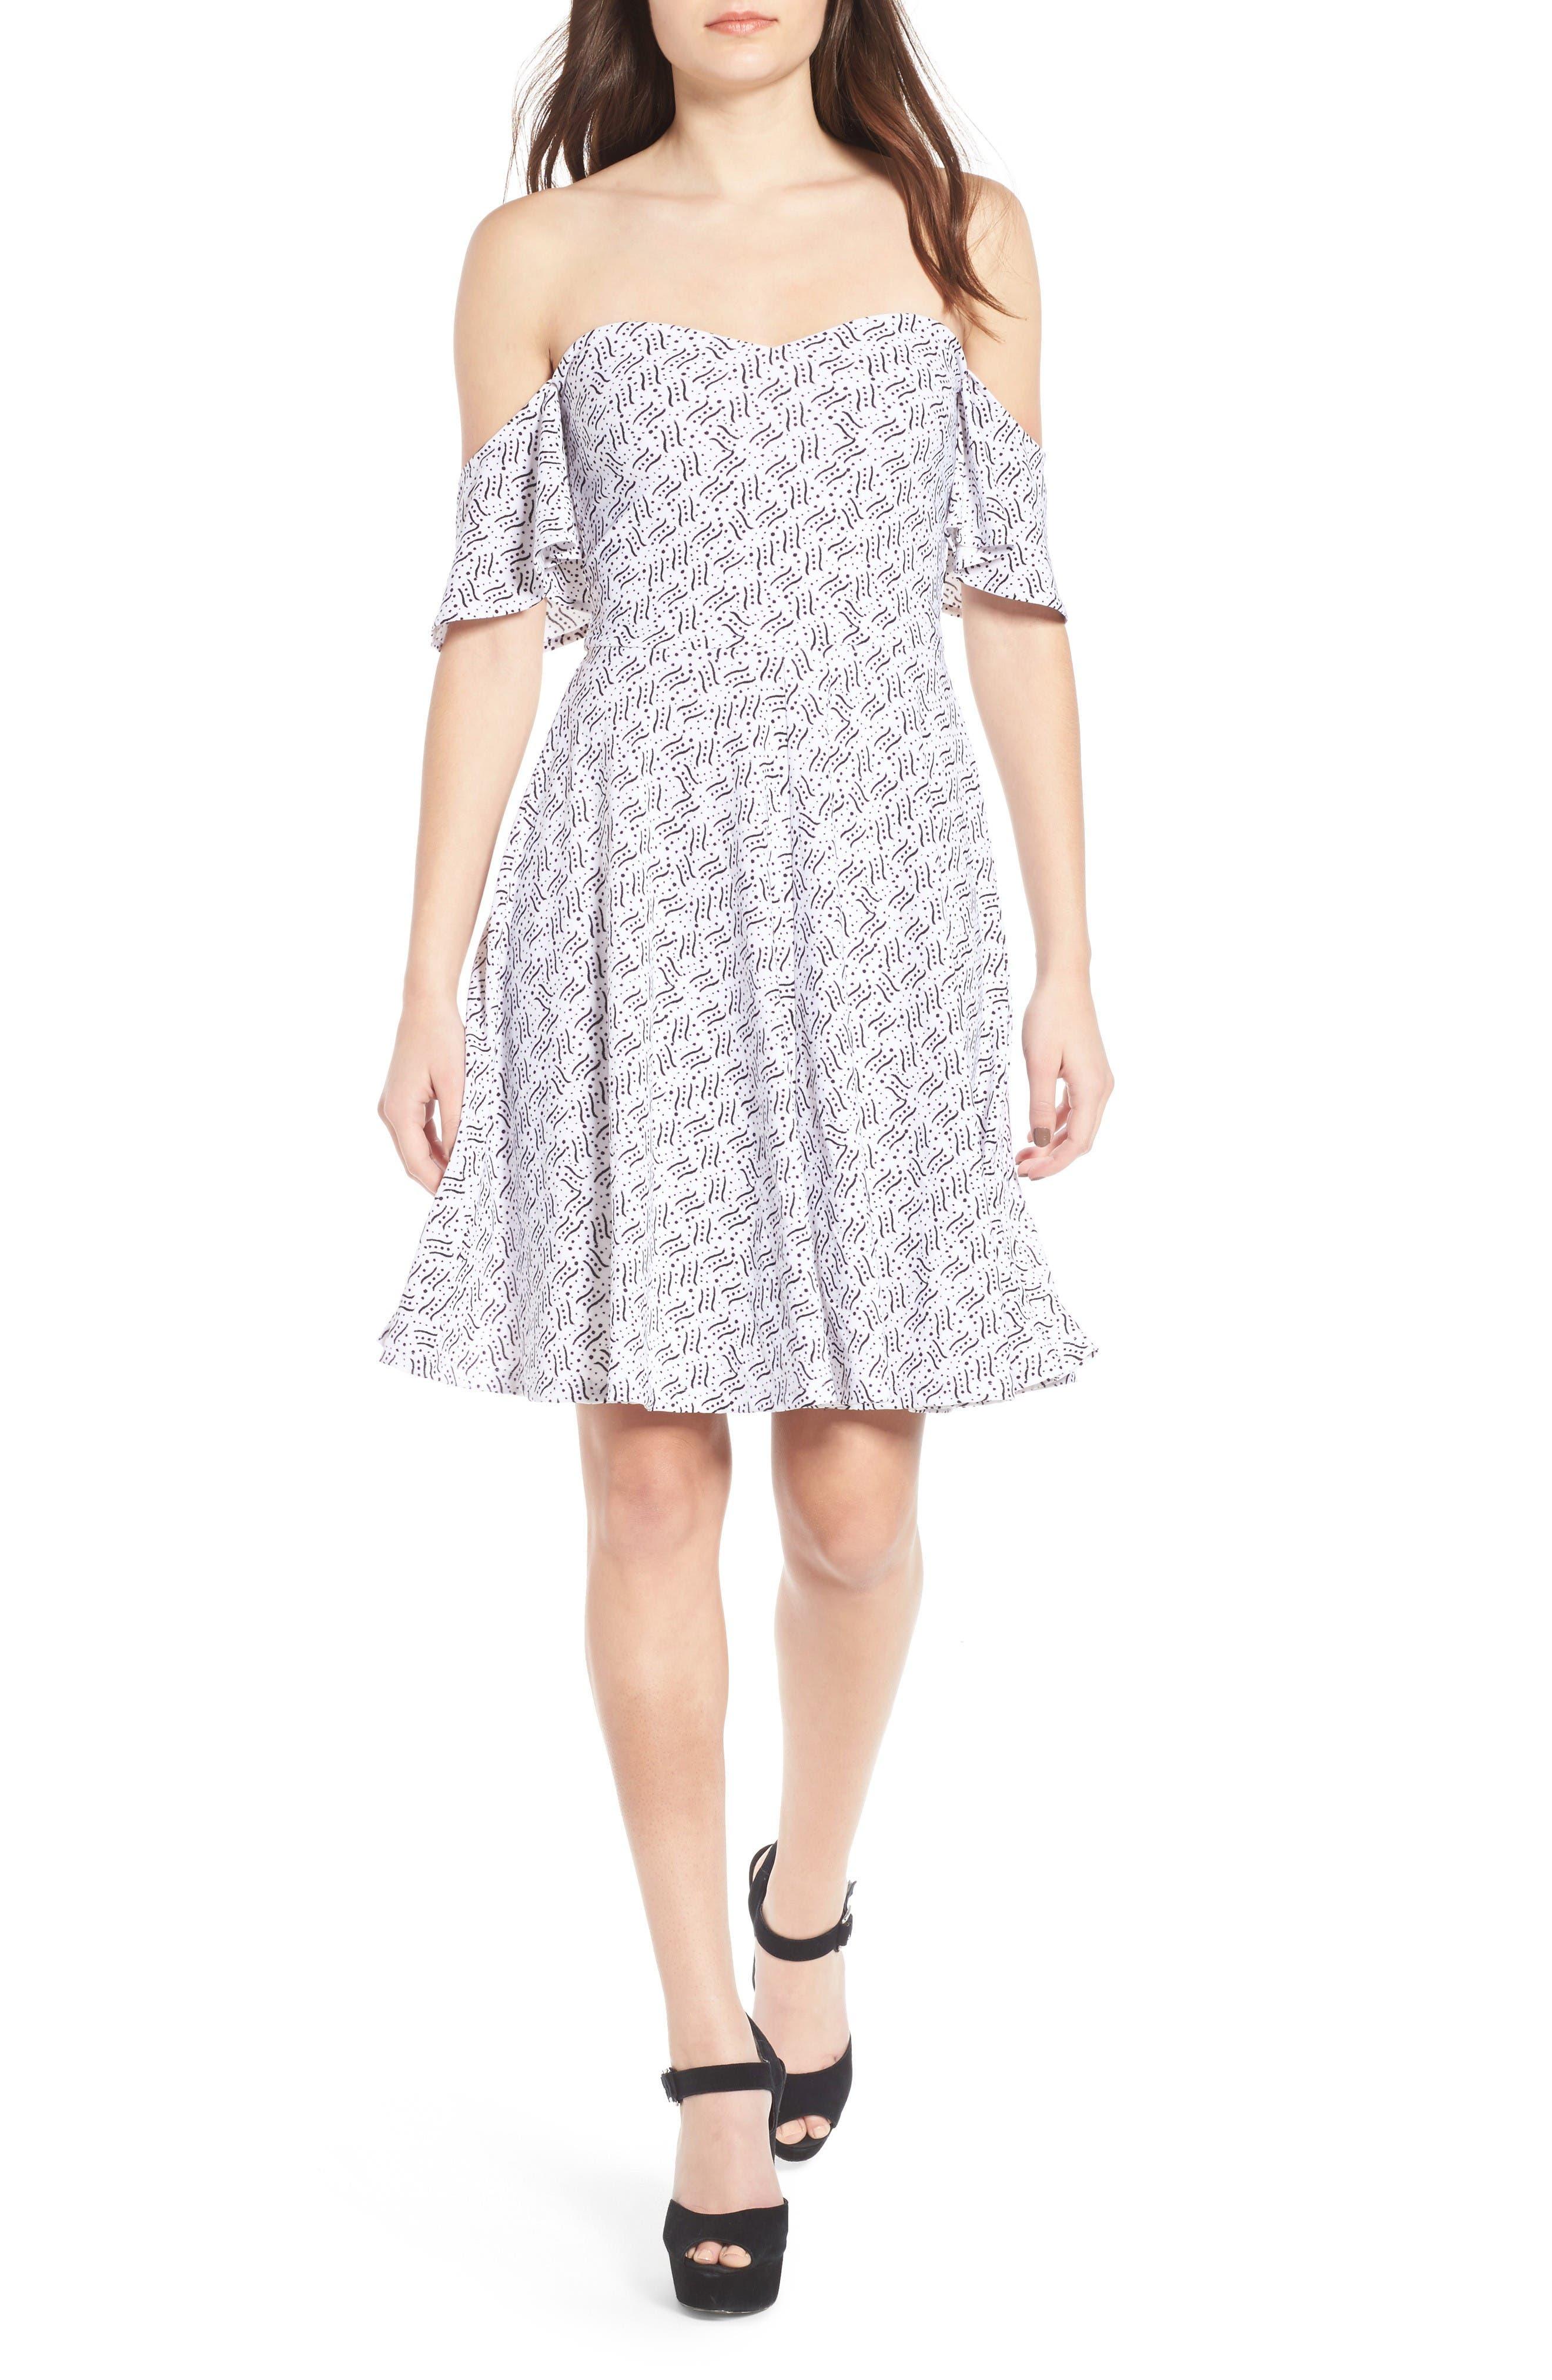 Alternate Image 1 Selected - Leith Off the Shoulder Fit & Flare Dress